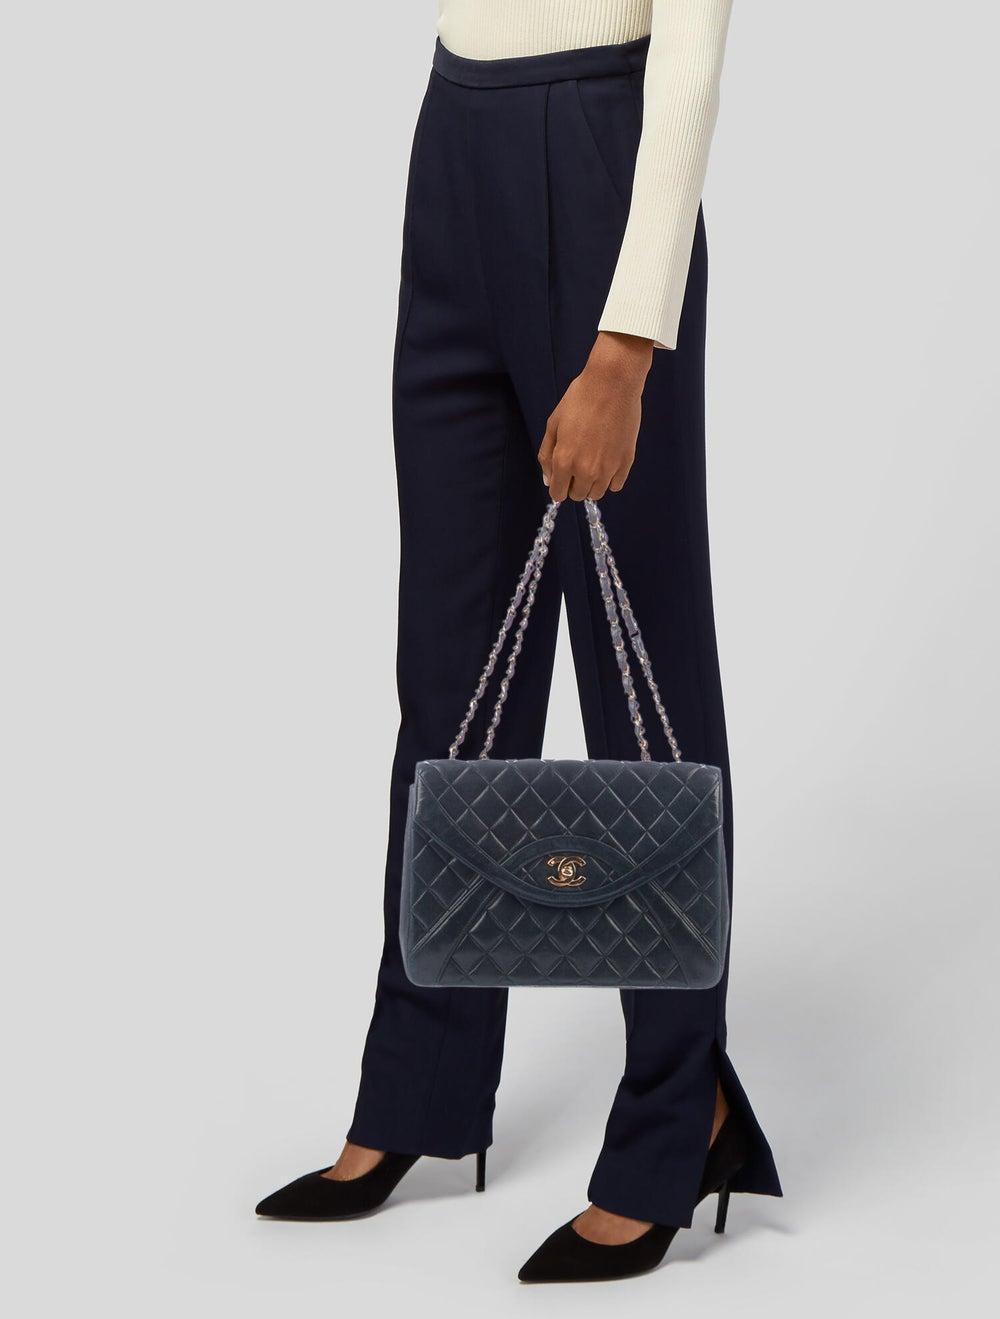 Chanel Vintage Half Moon Flap Bag Blue - image 2